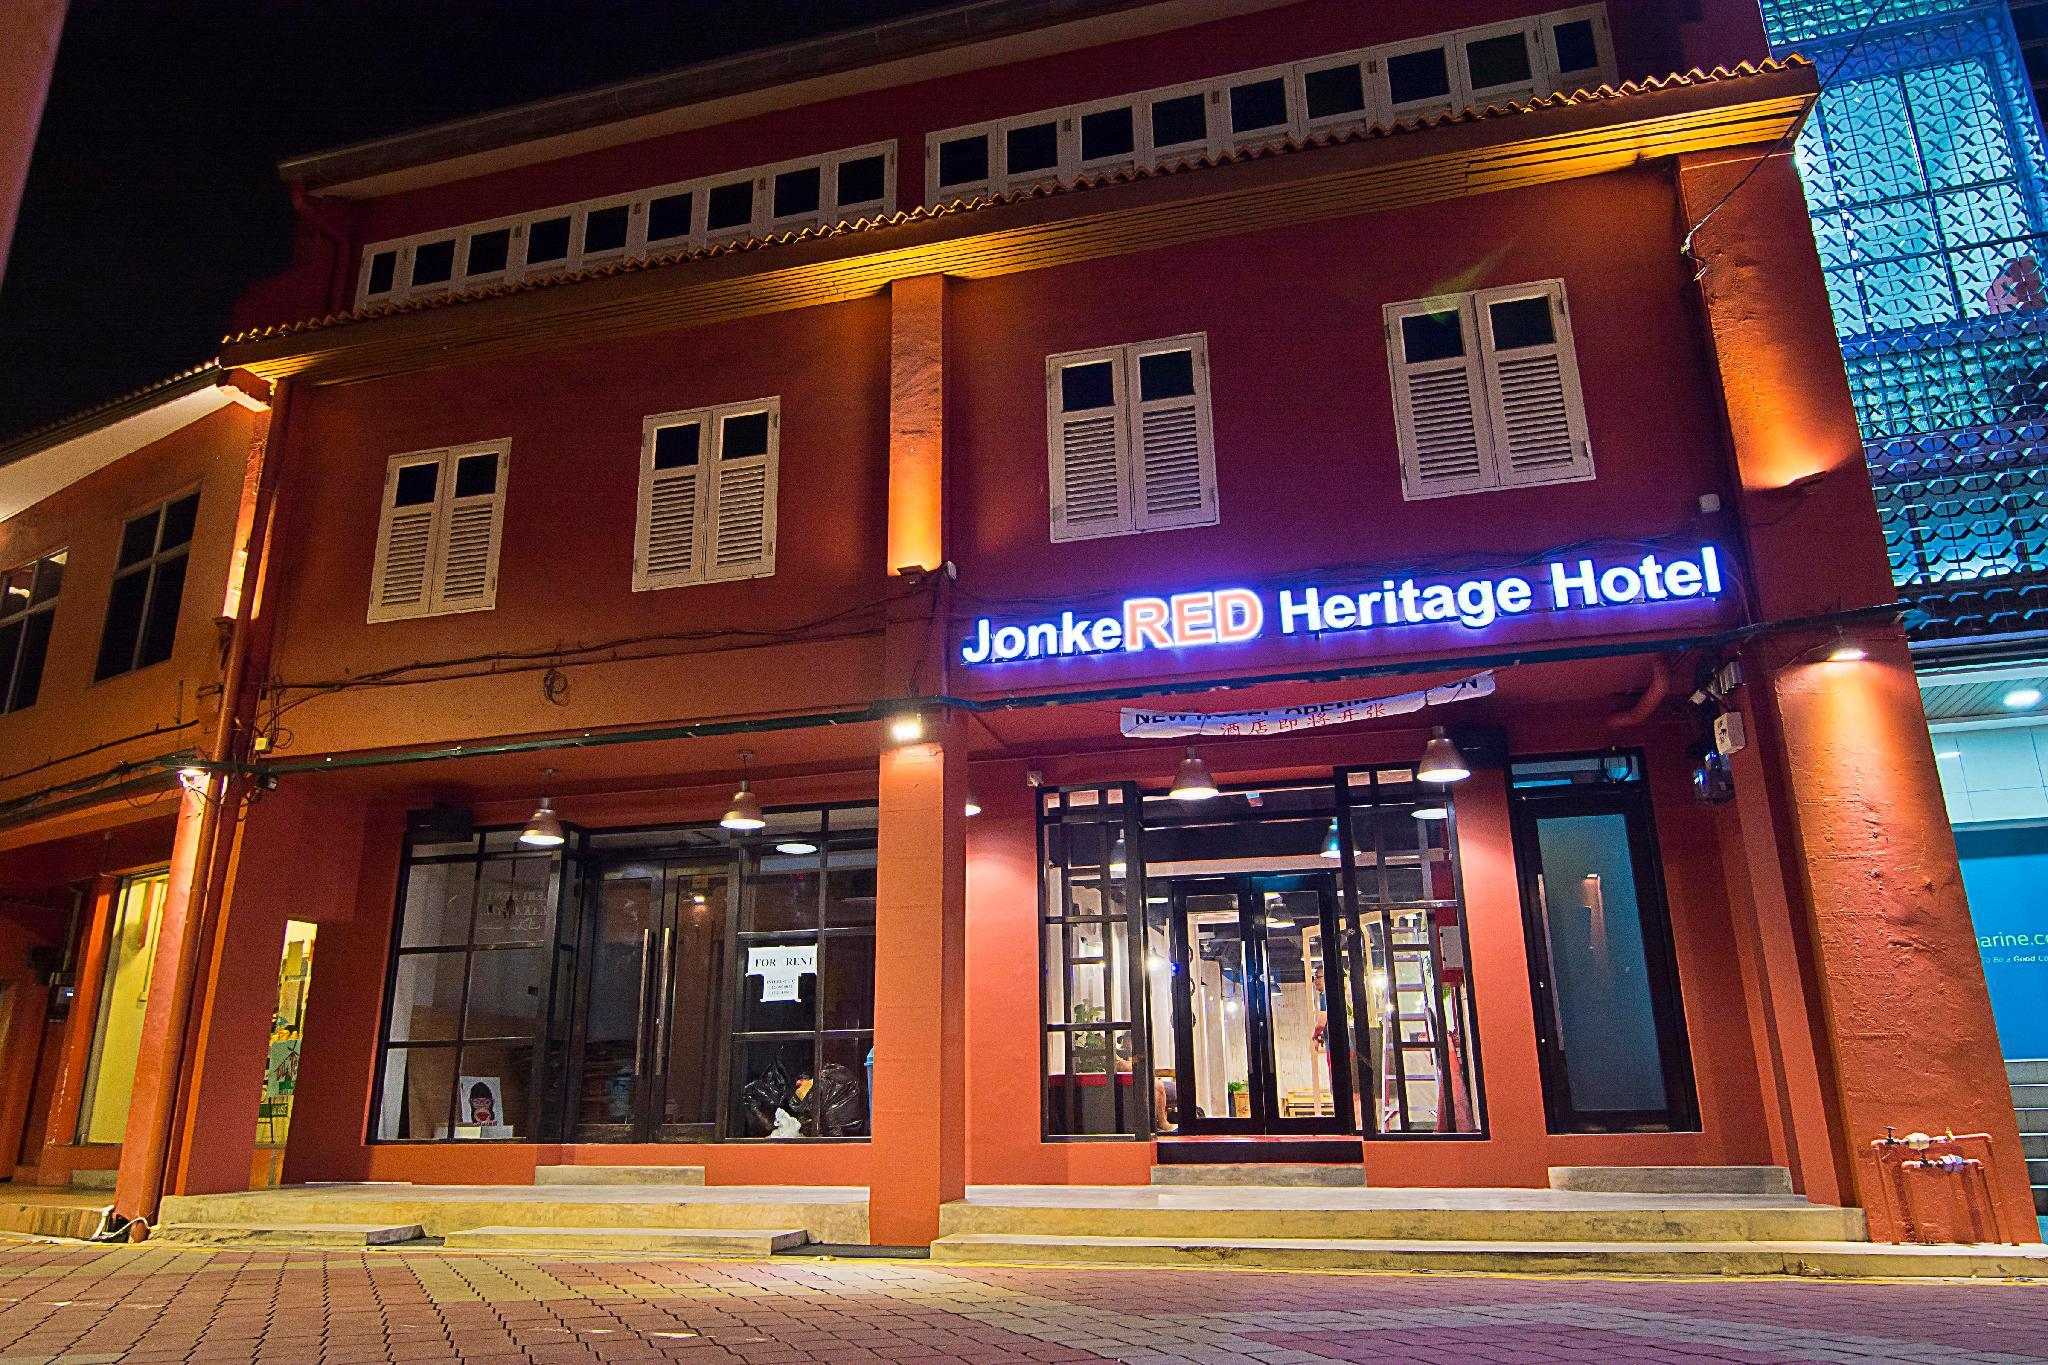 JonkeRED Heritage Hotel